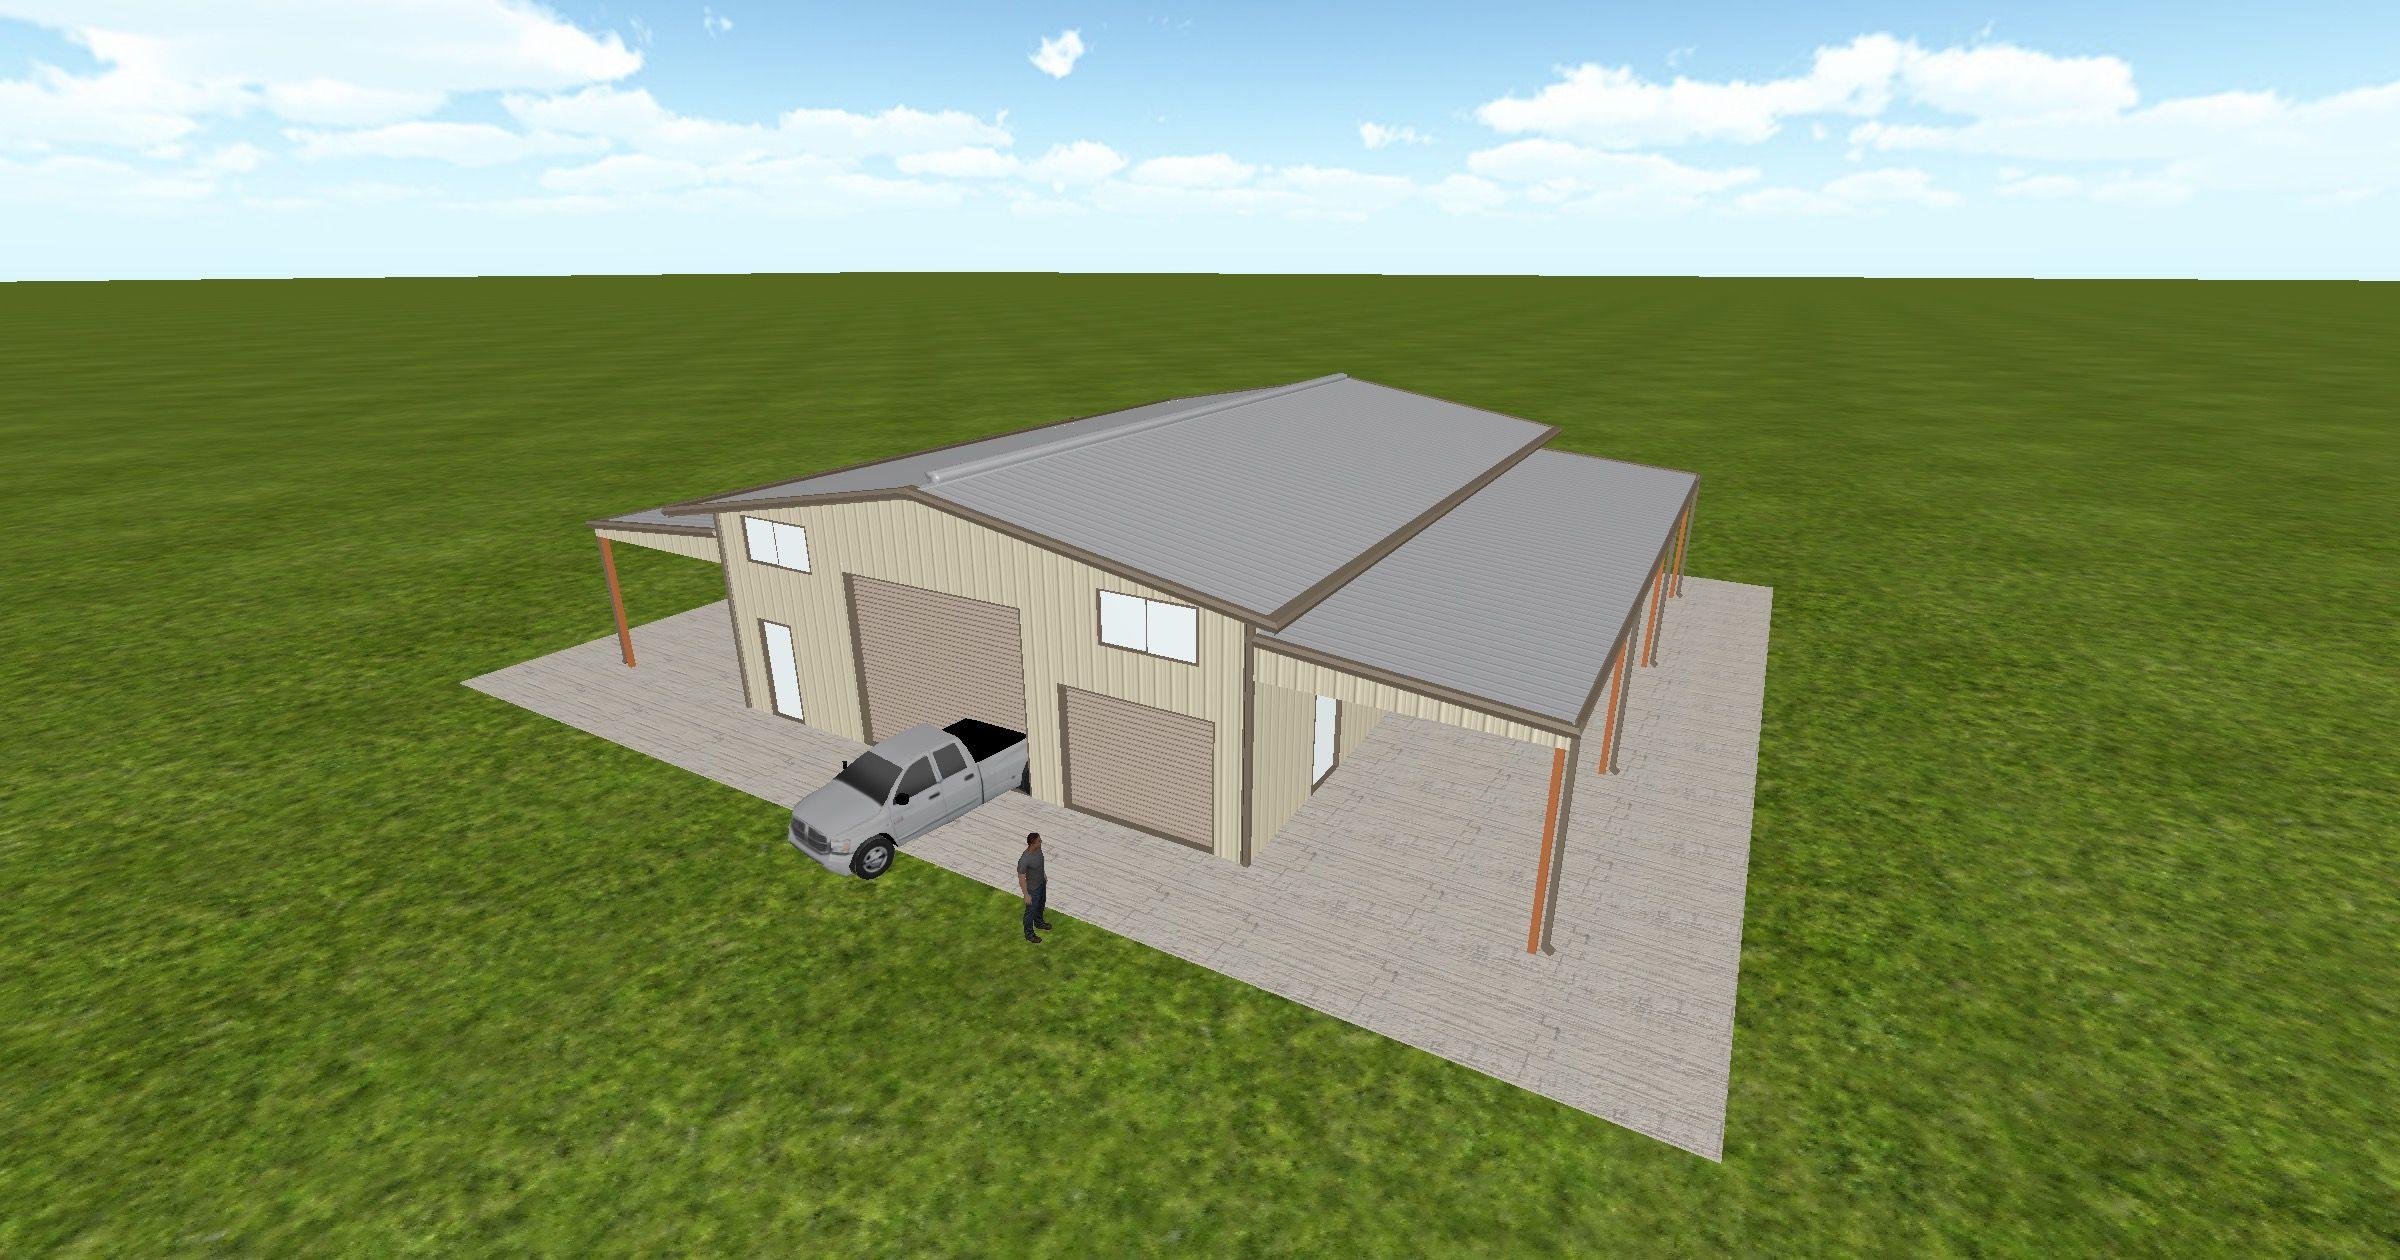 #3D #Building built using #Viral3D web-based #design tool http://ift.tt/1Ima5tF #360 #virtual #construction